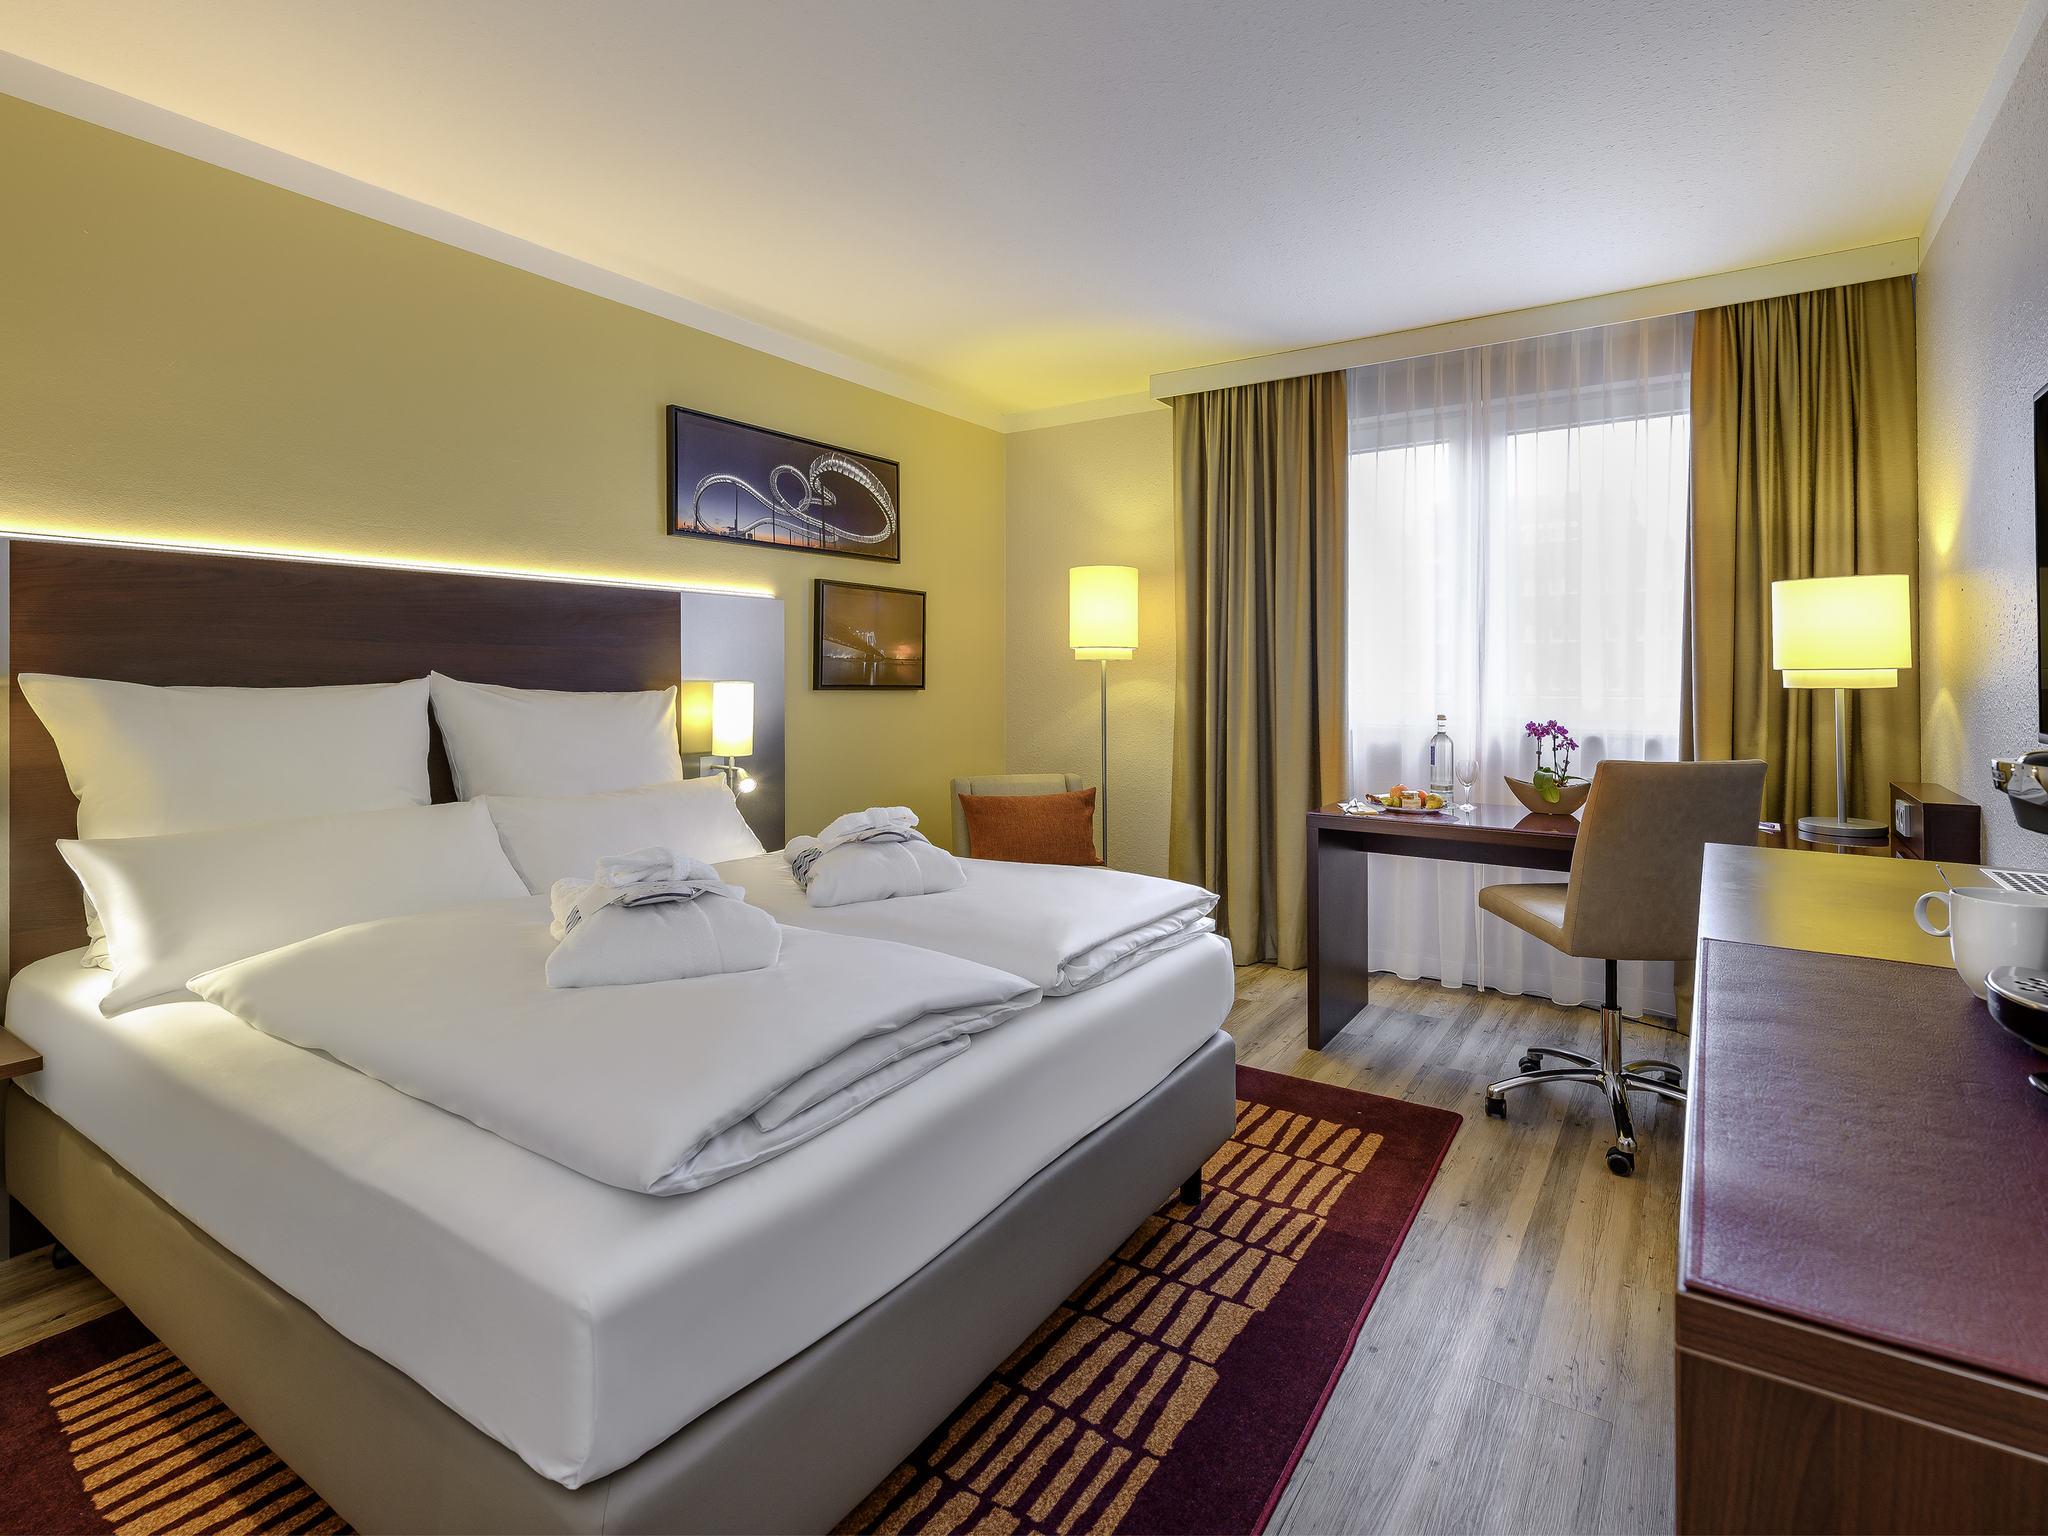 Hotel Mercure Oberhausen